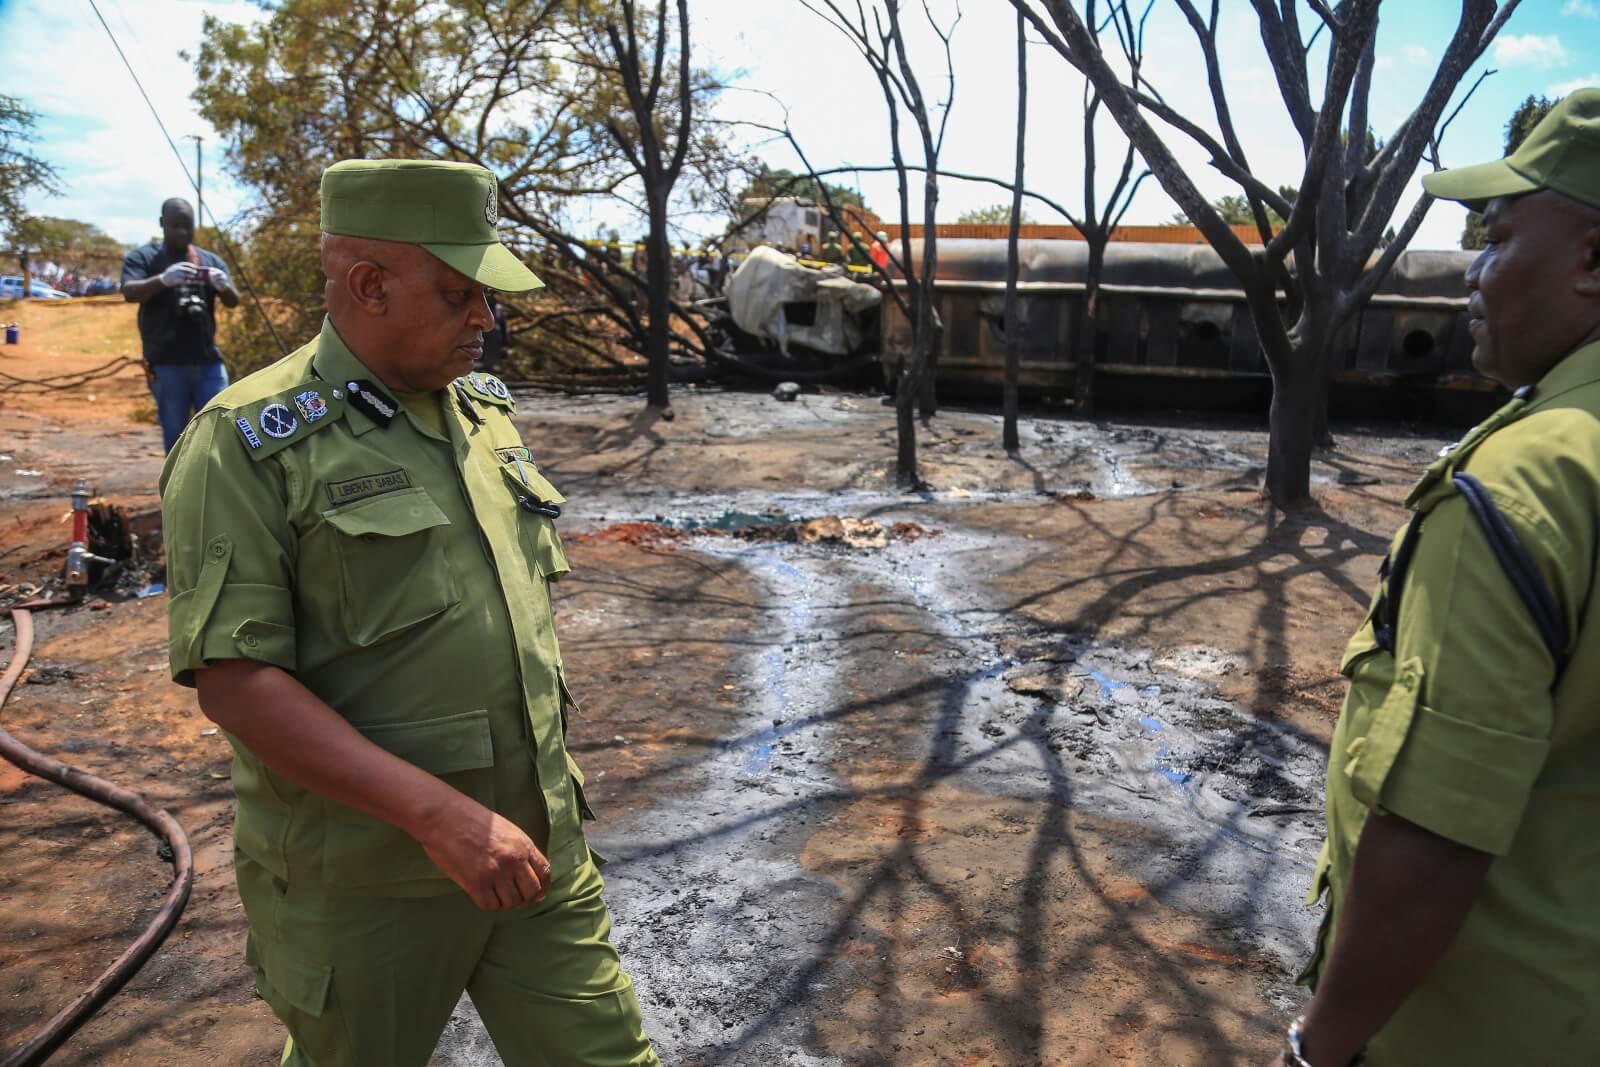 Wybuch tankowca w Tanzanii fot. EPA/MBAROUK KHAAN